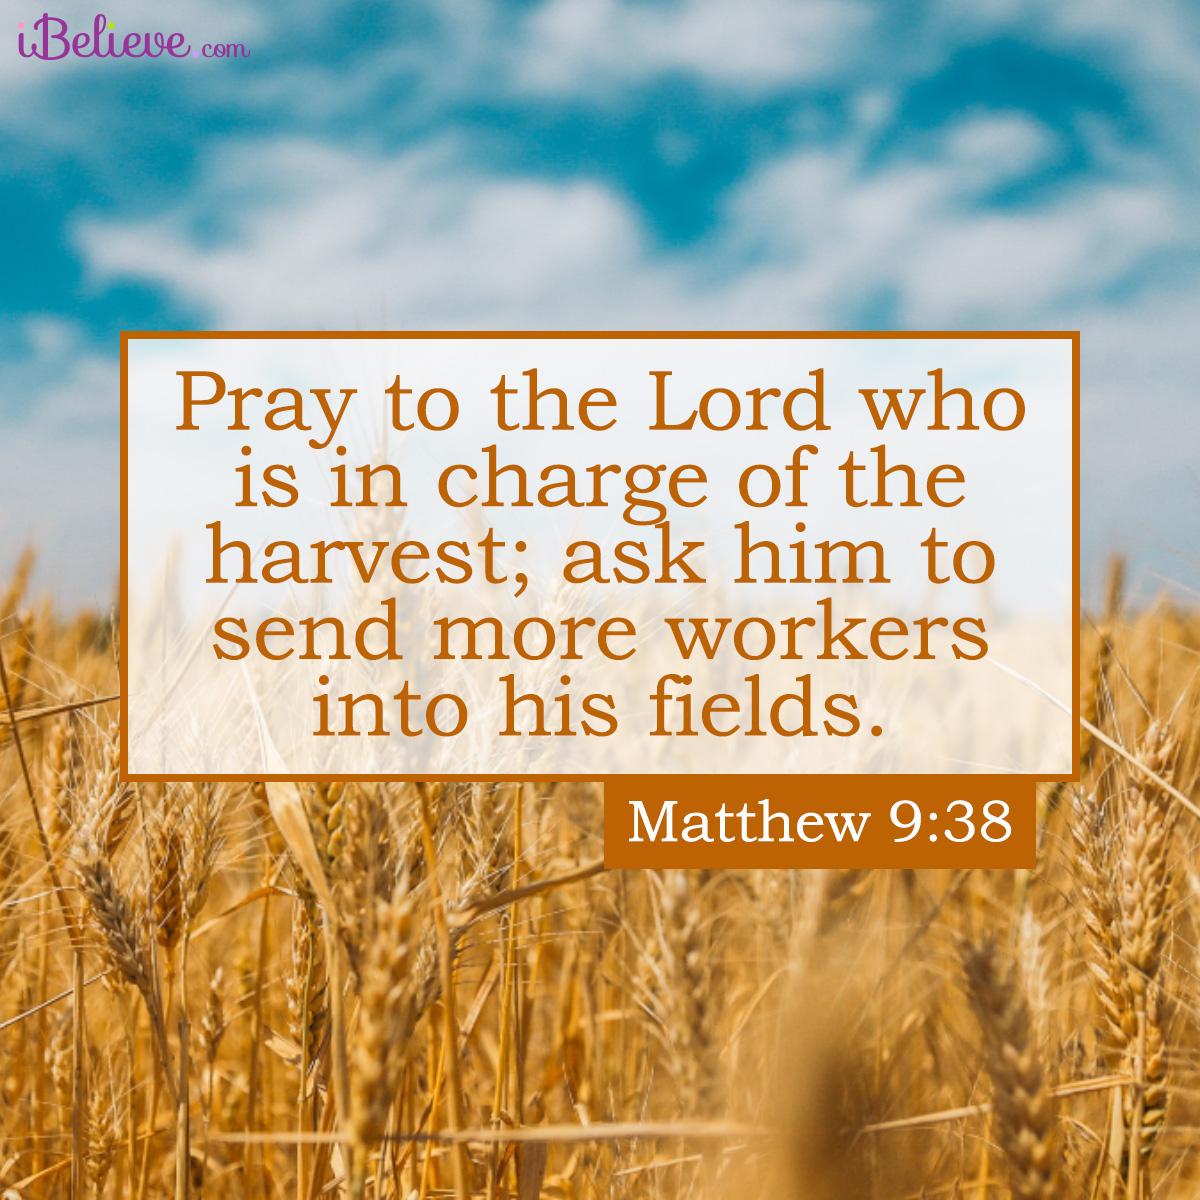 Matthew 9:38 inspirational image